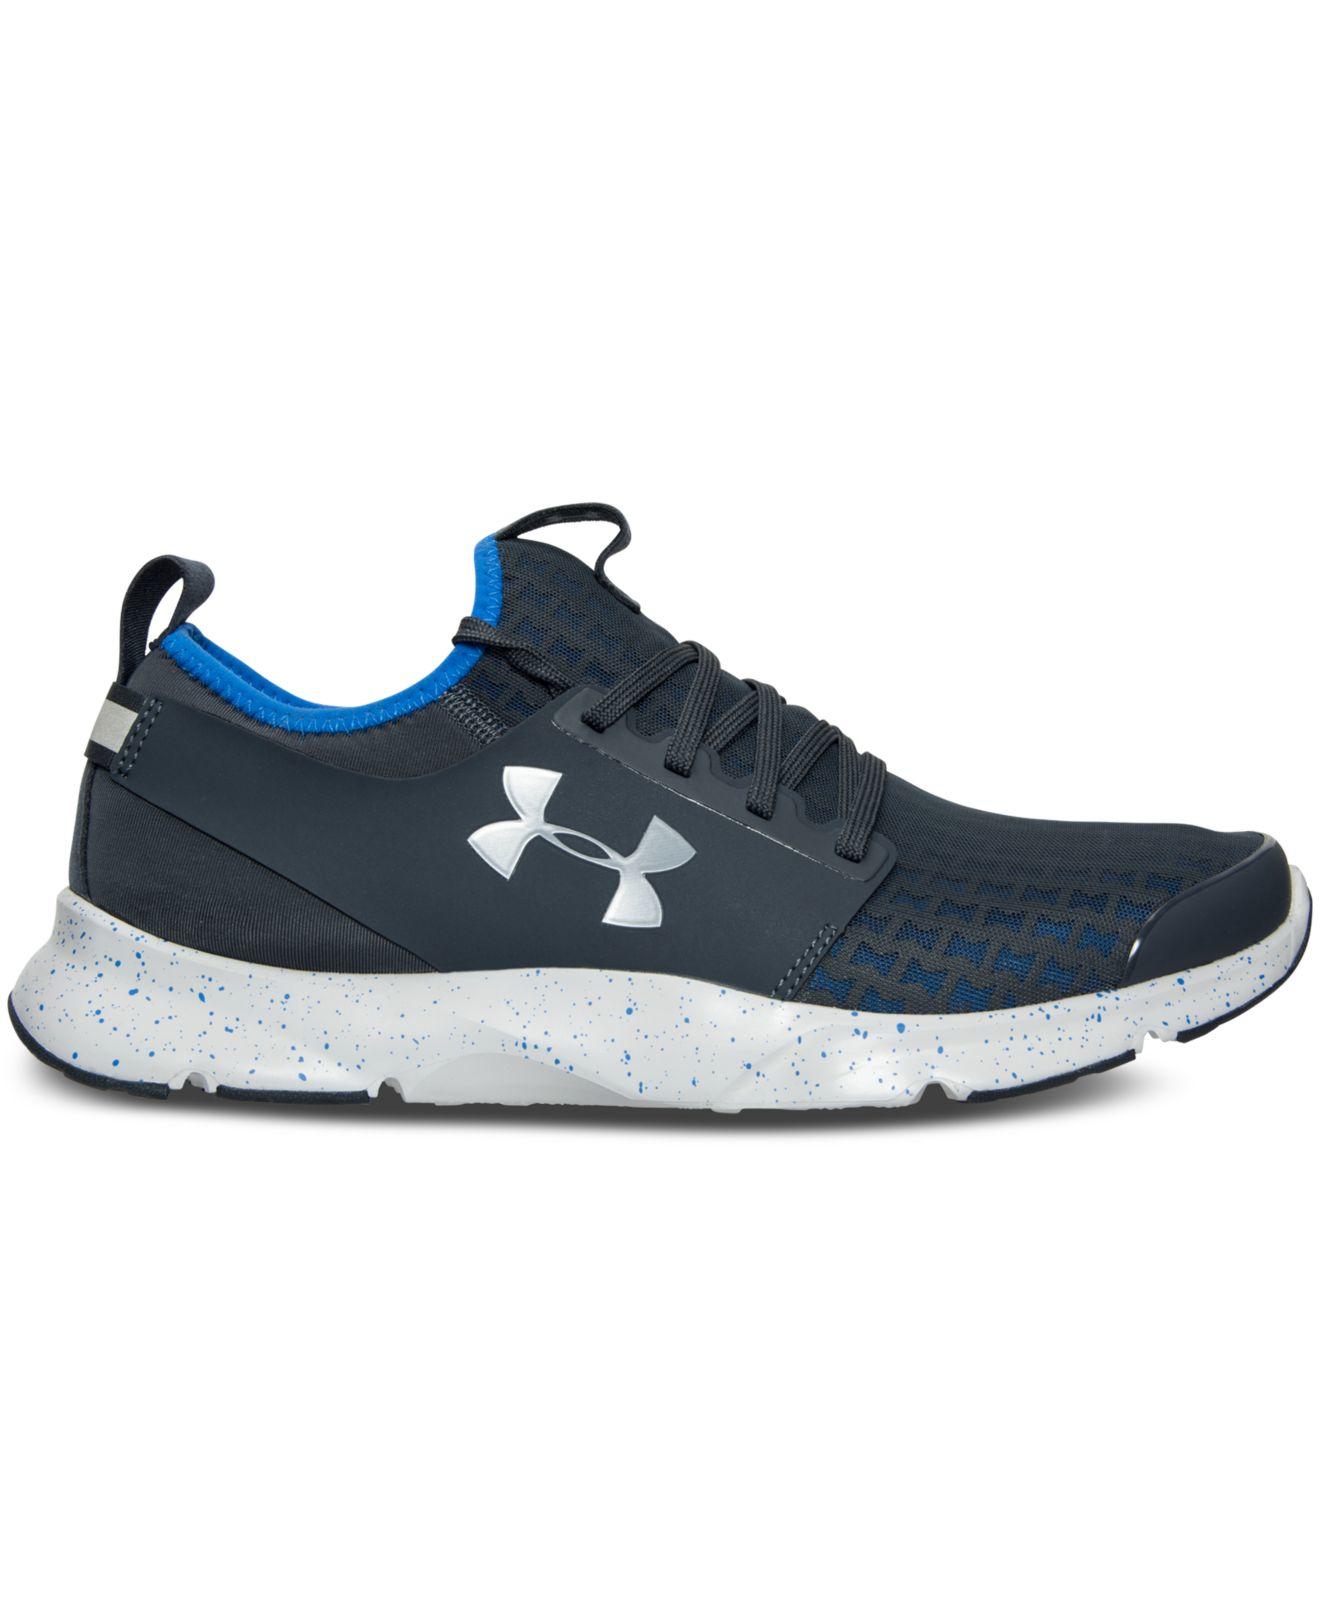 Lyst Under Armour Men S Drift Running Sneakers From